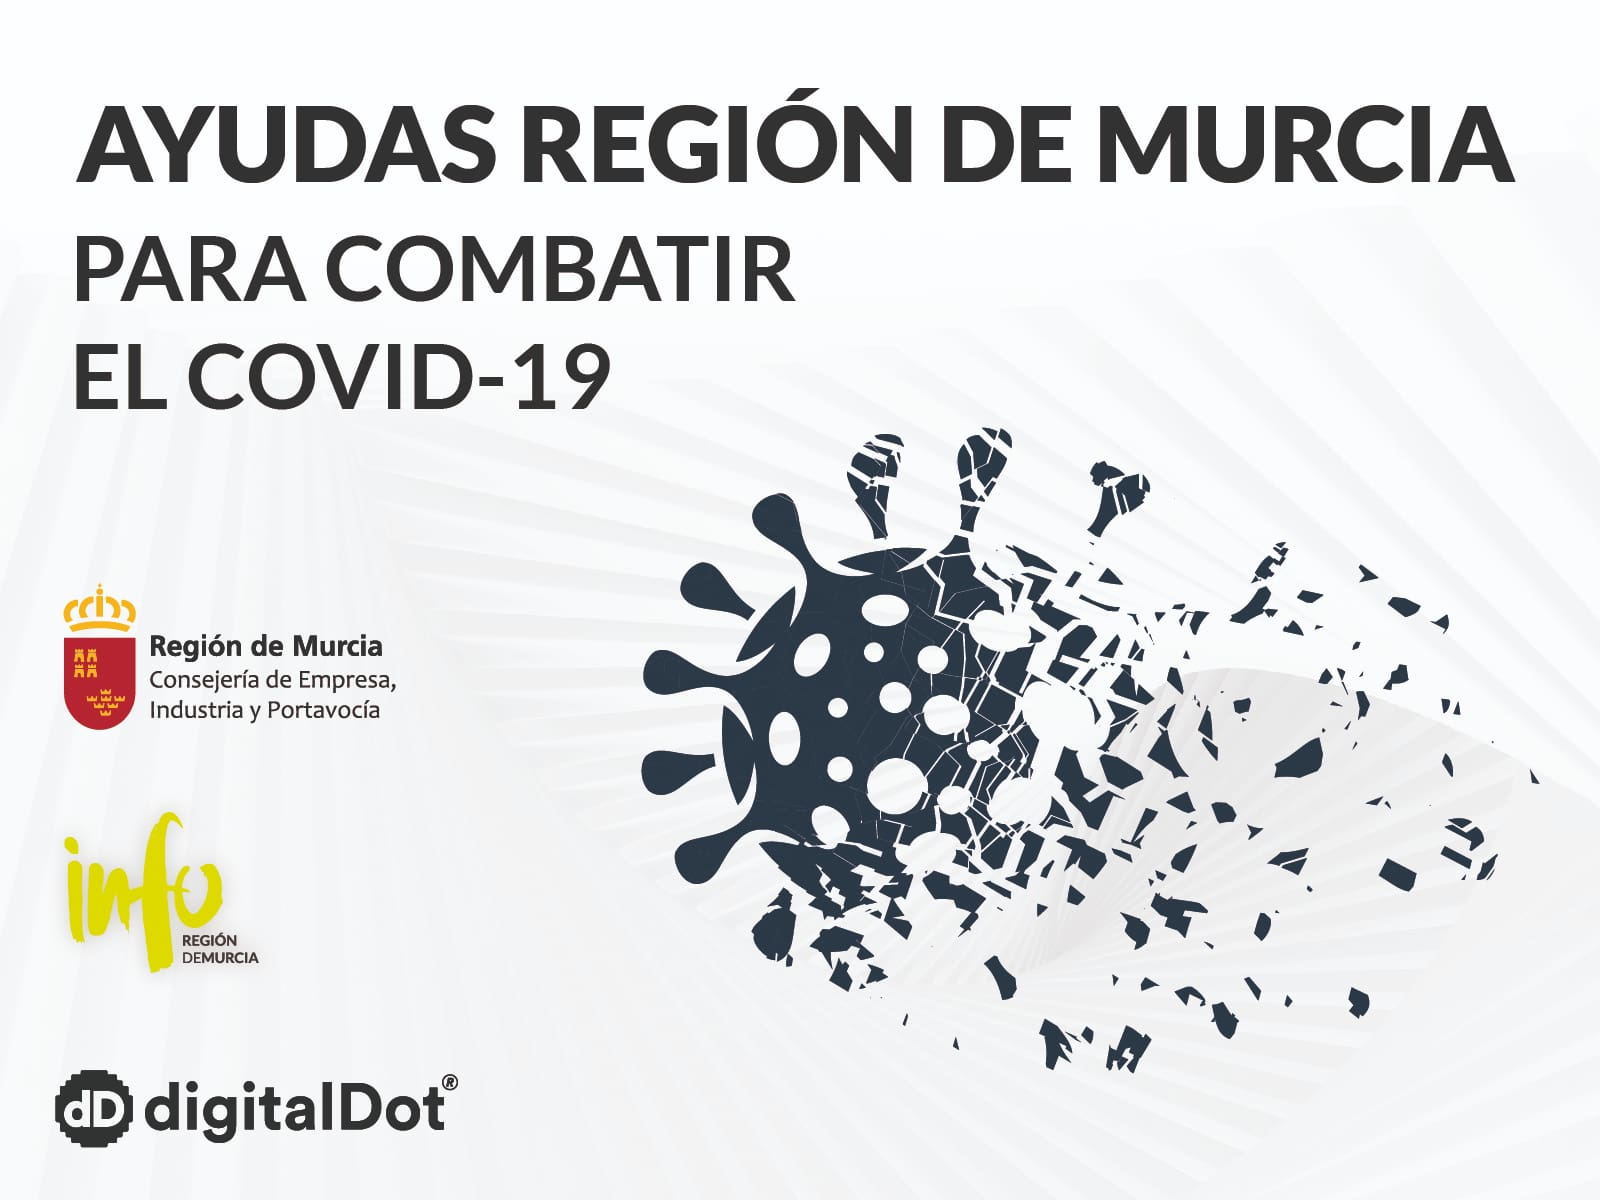 Ayudas COVID-19 para empresas de Murcia